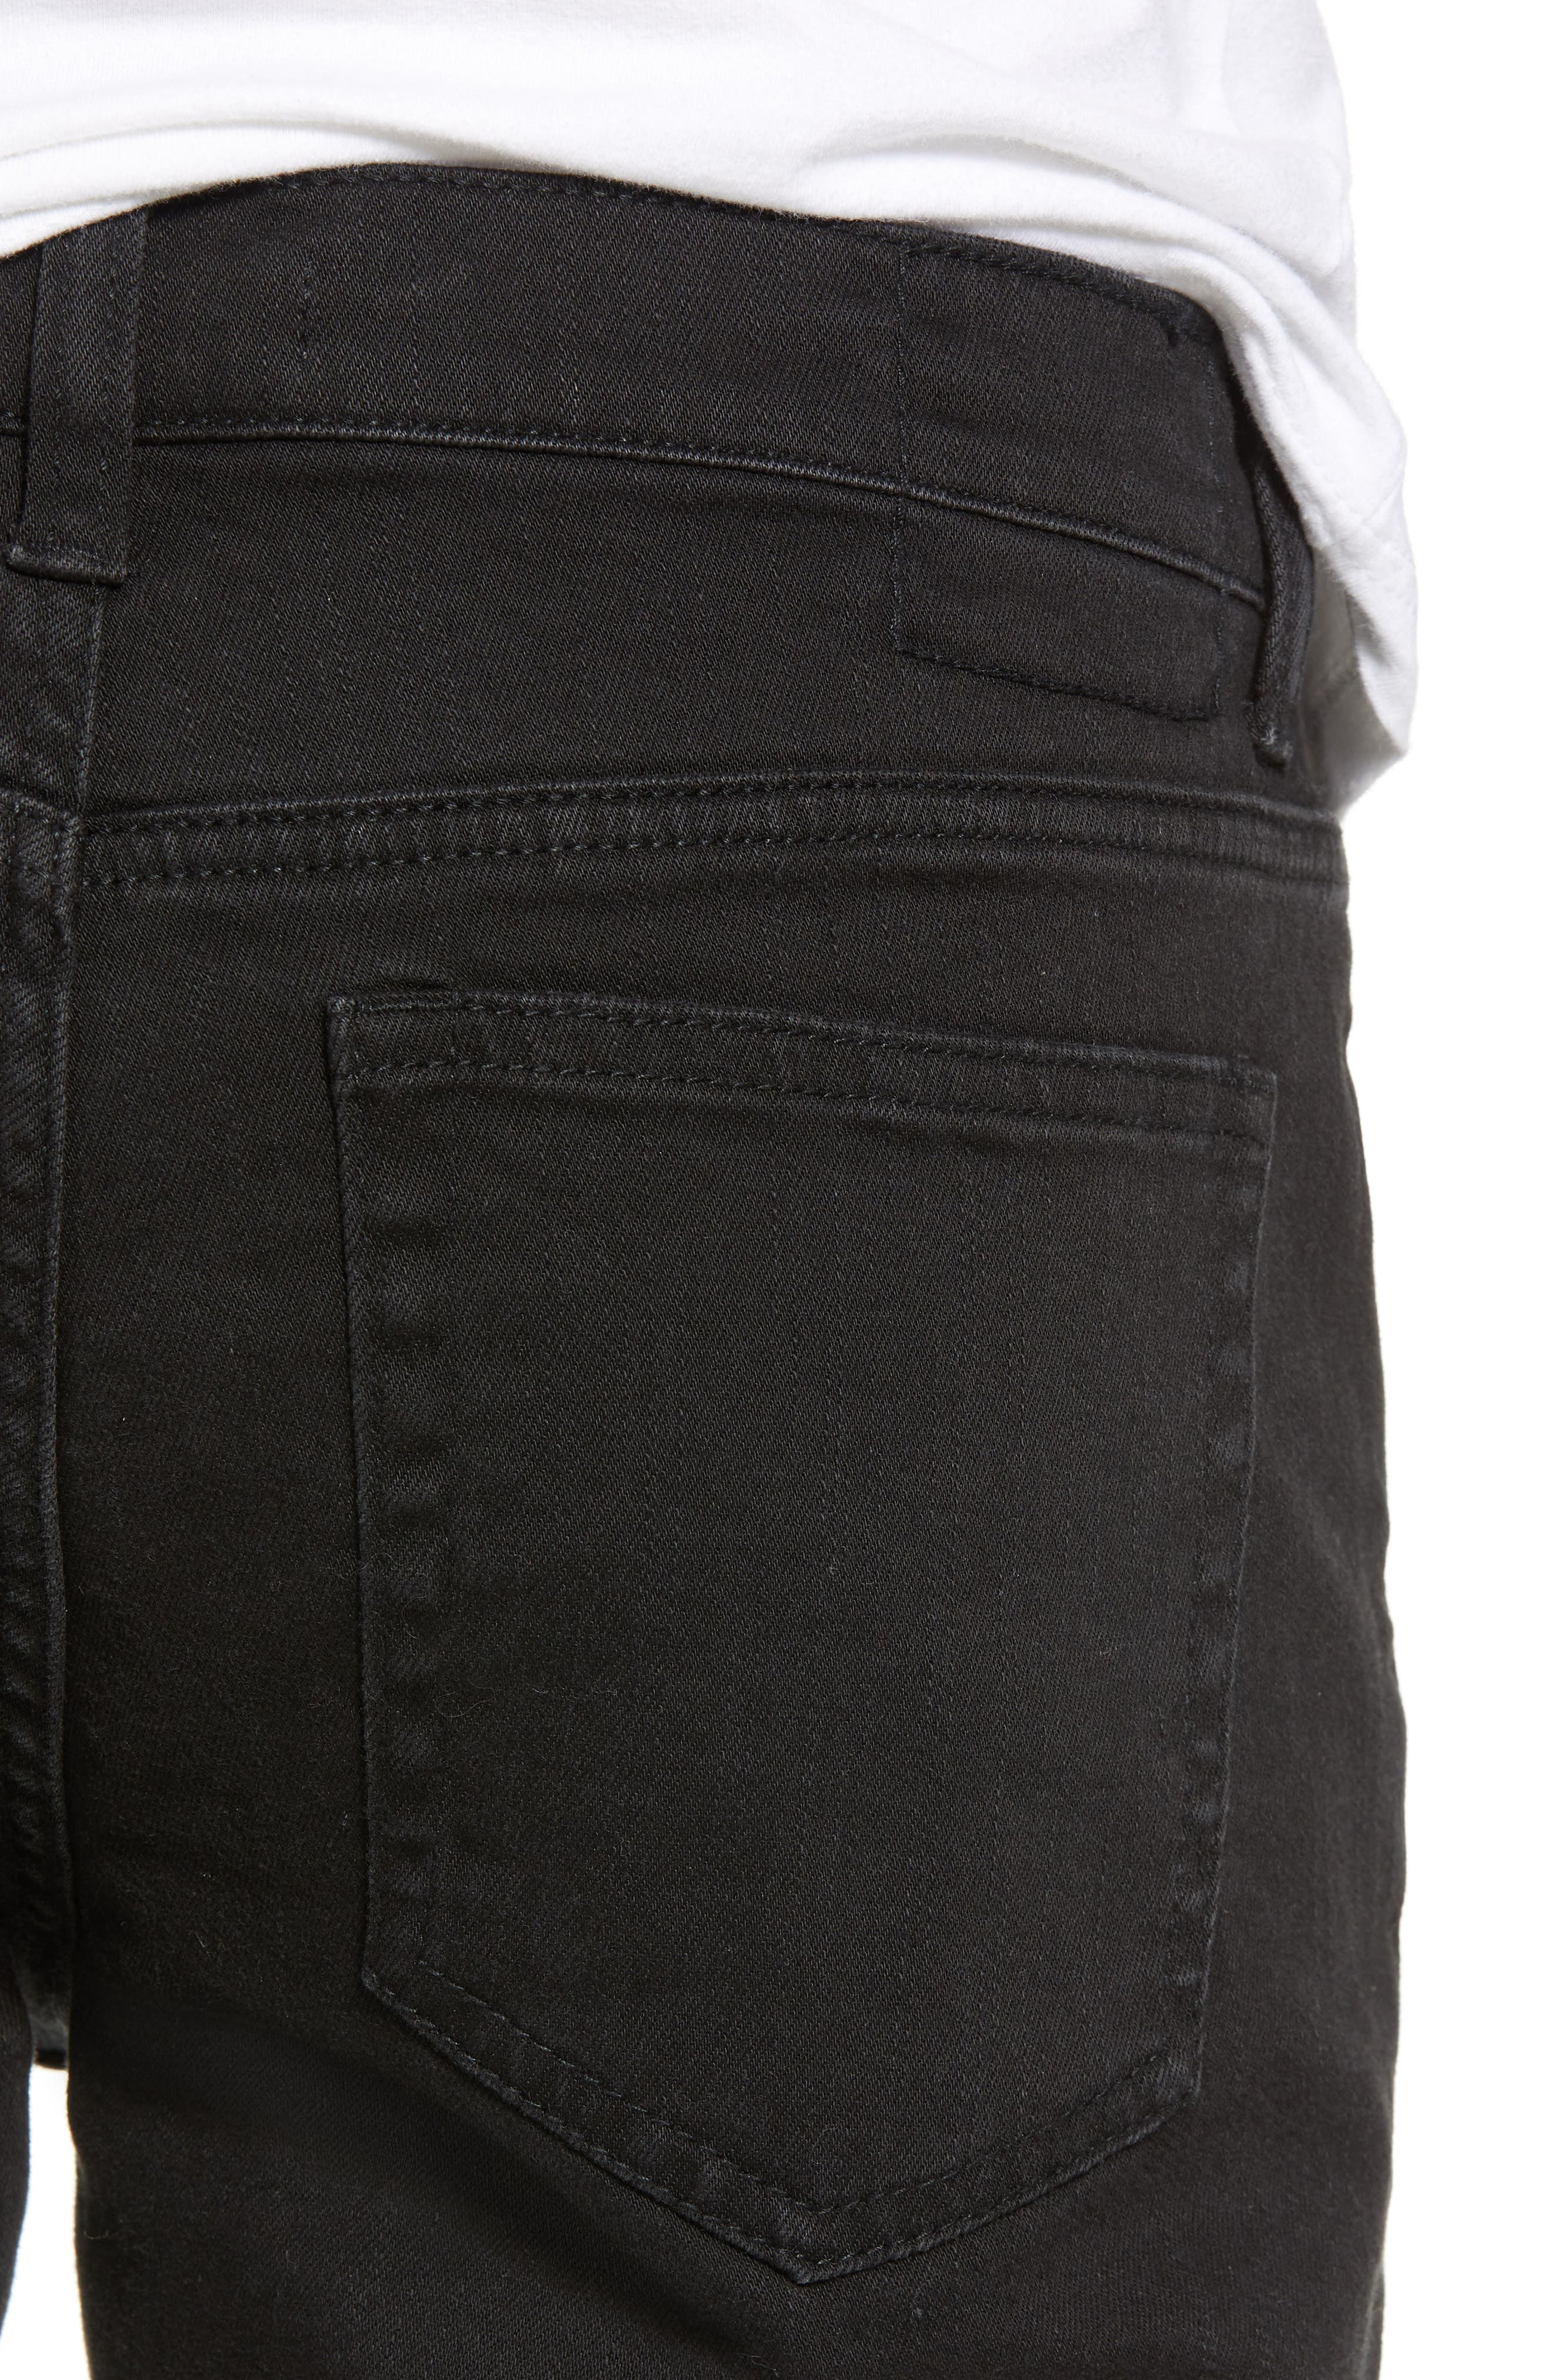 Ripped Skinny Jeans,                             Alternate thumbnail 4, color,                             BLACK STONE WASH